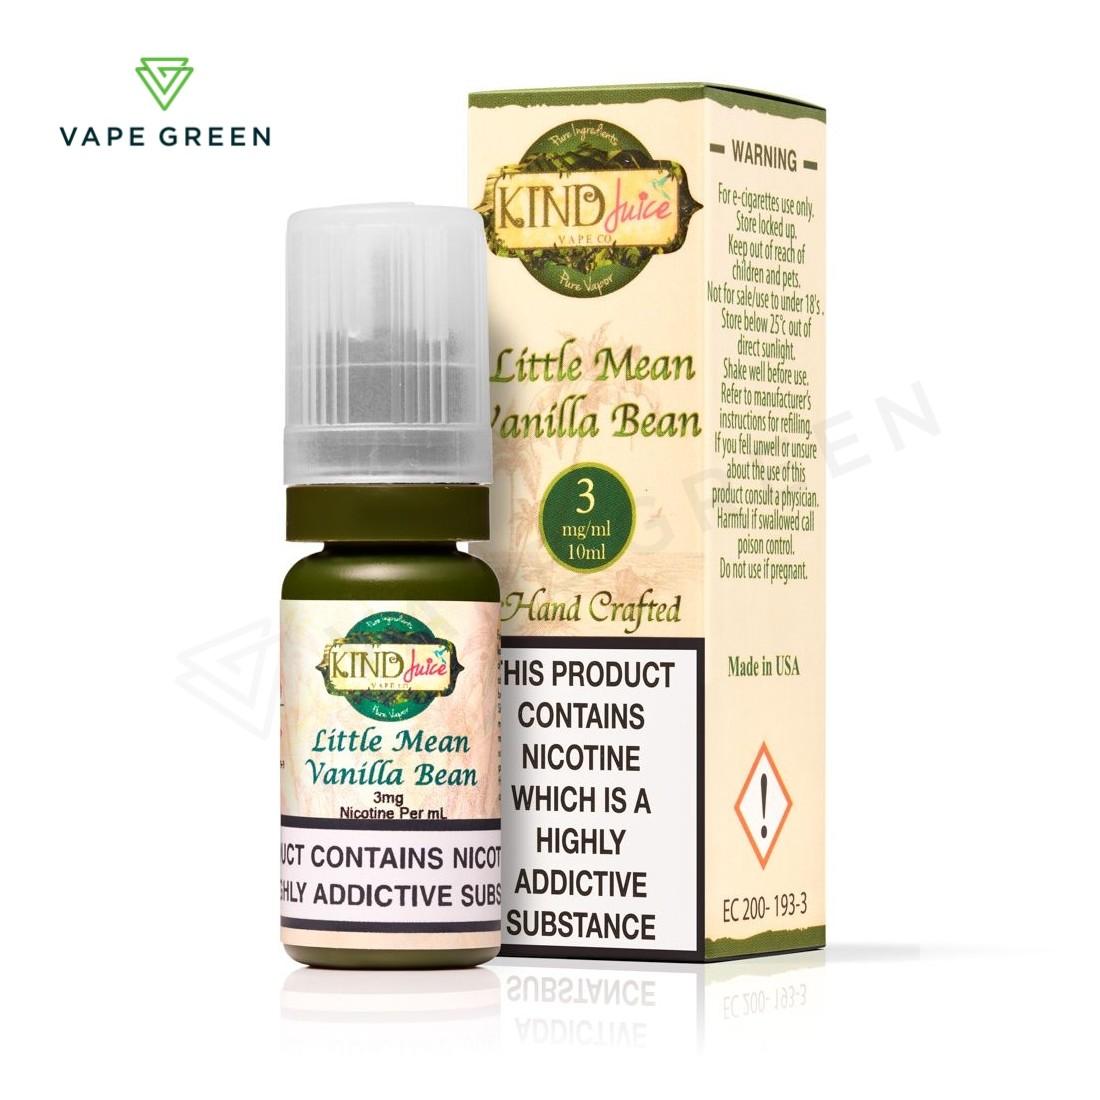 Little Mean Vanilla Bean E-Liquid by Kind Juice